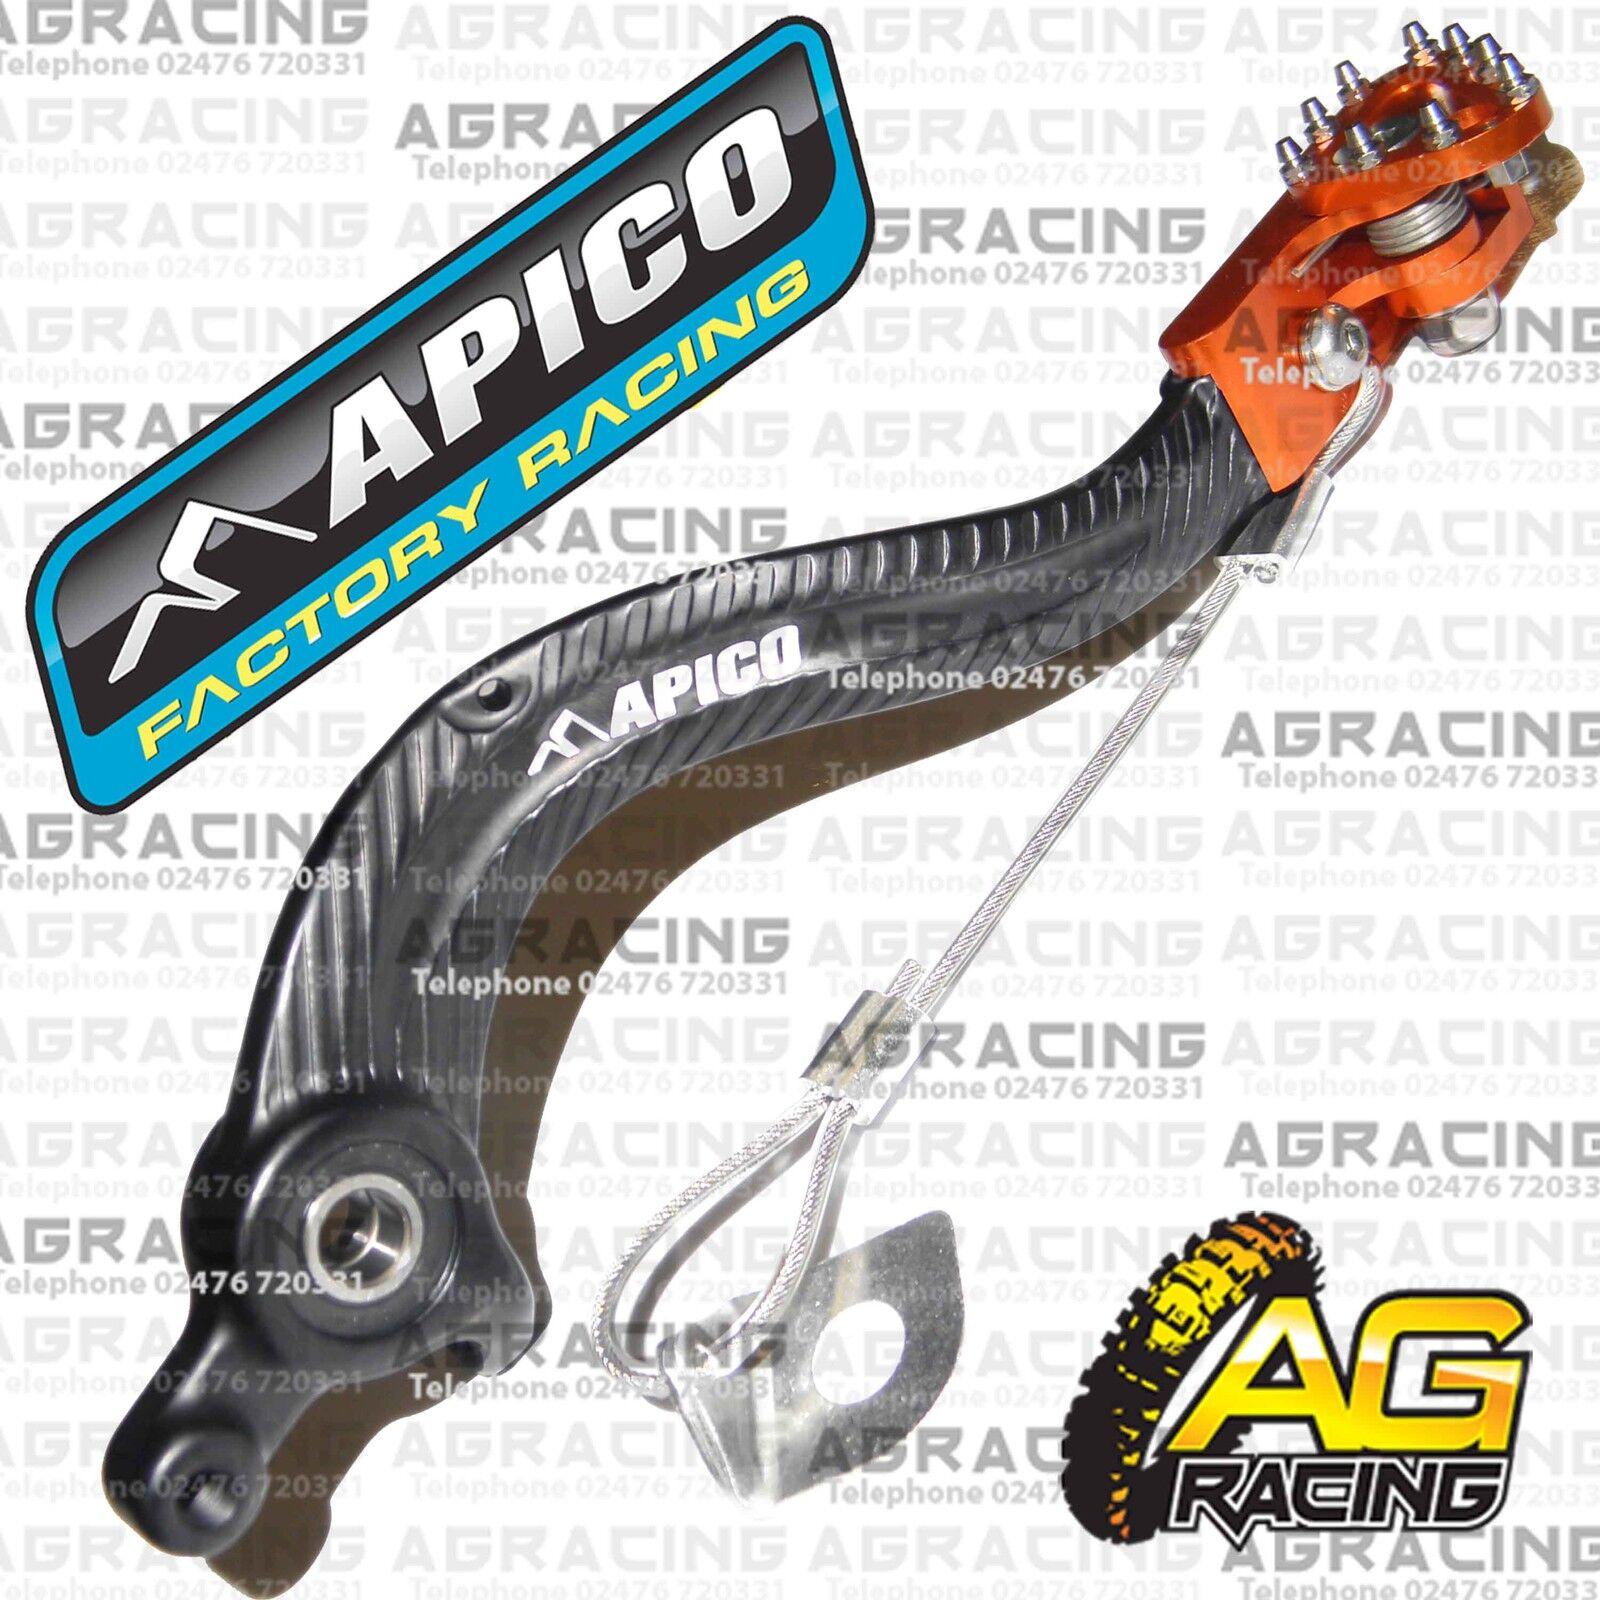 Apico Black Orange Gear Pedal Lever Shift For KTM EXC 125 2008 Motocross Enduro